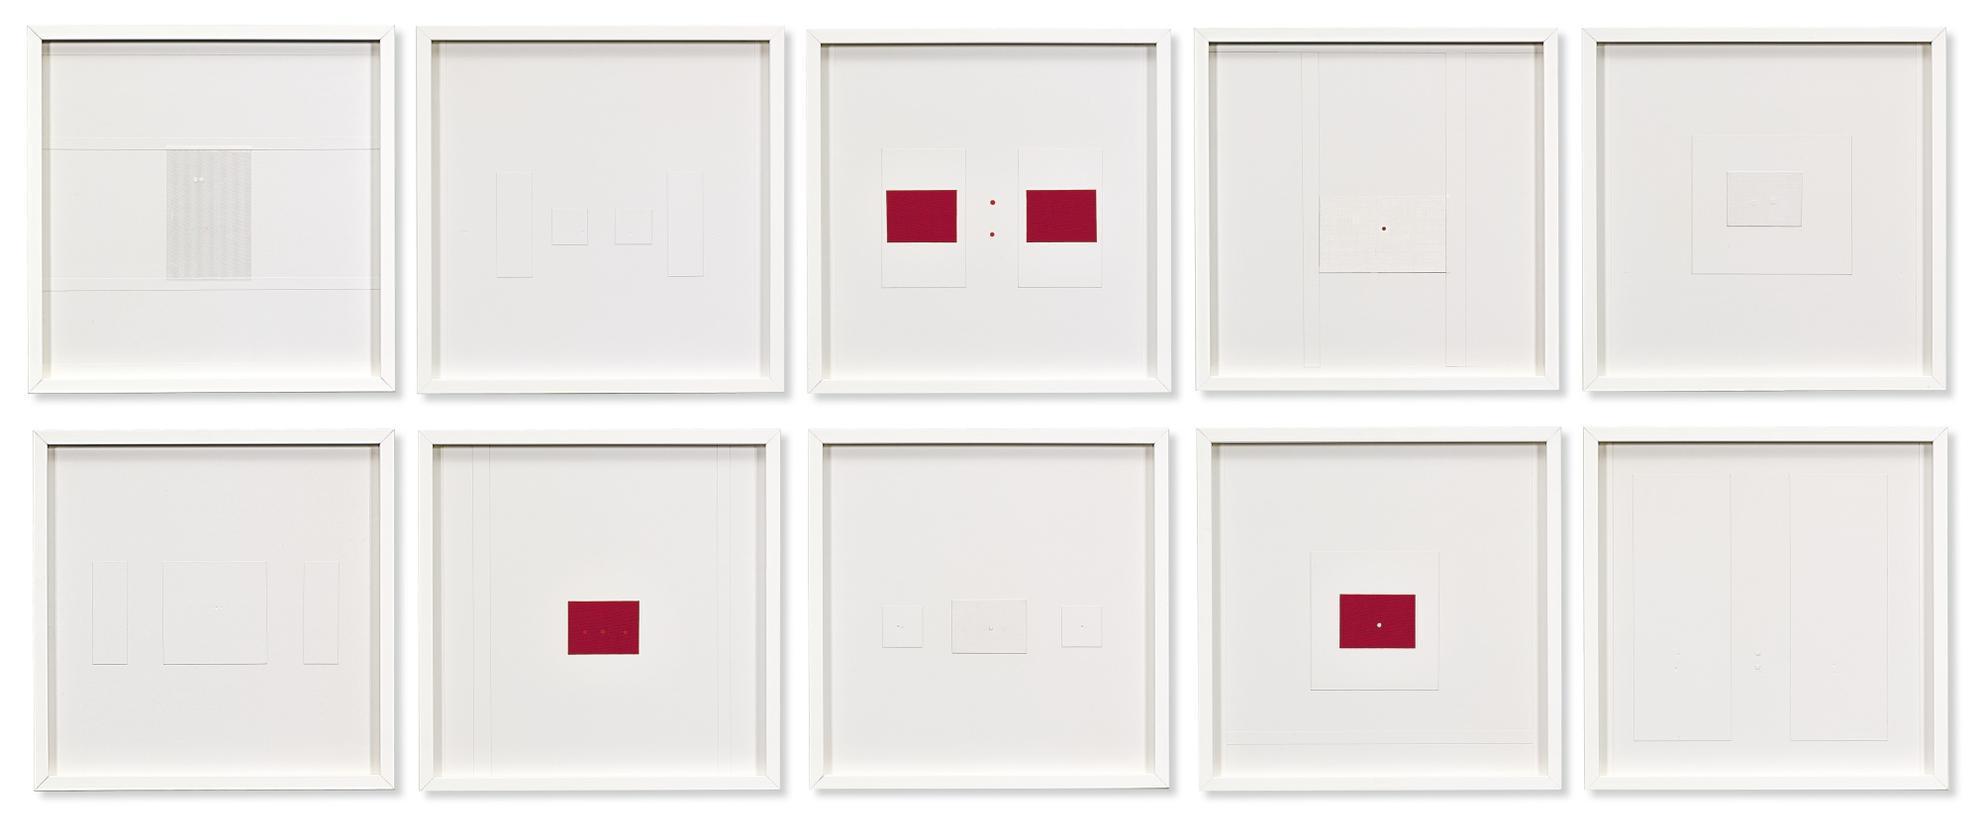 Li Yuan-Chia - Study Of Cosmic Point (Ten Works)-1962